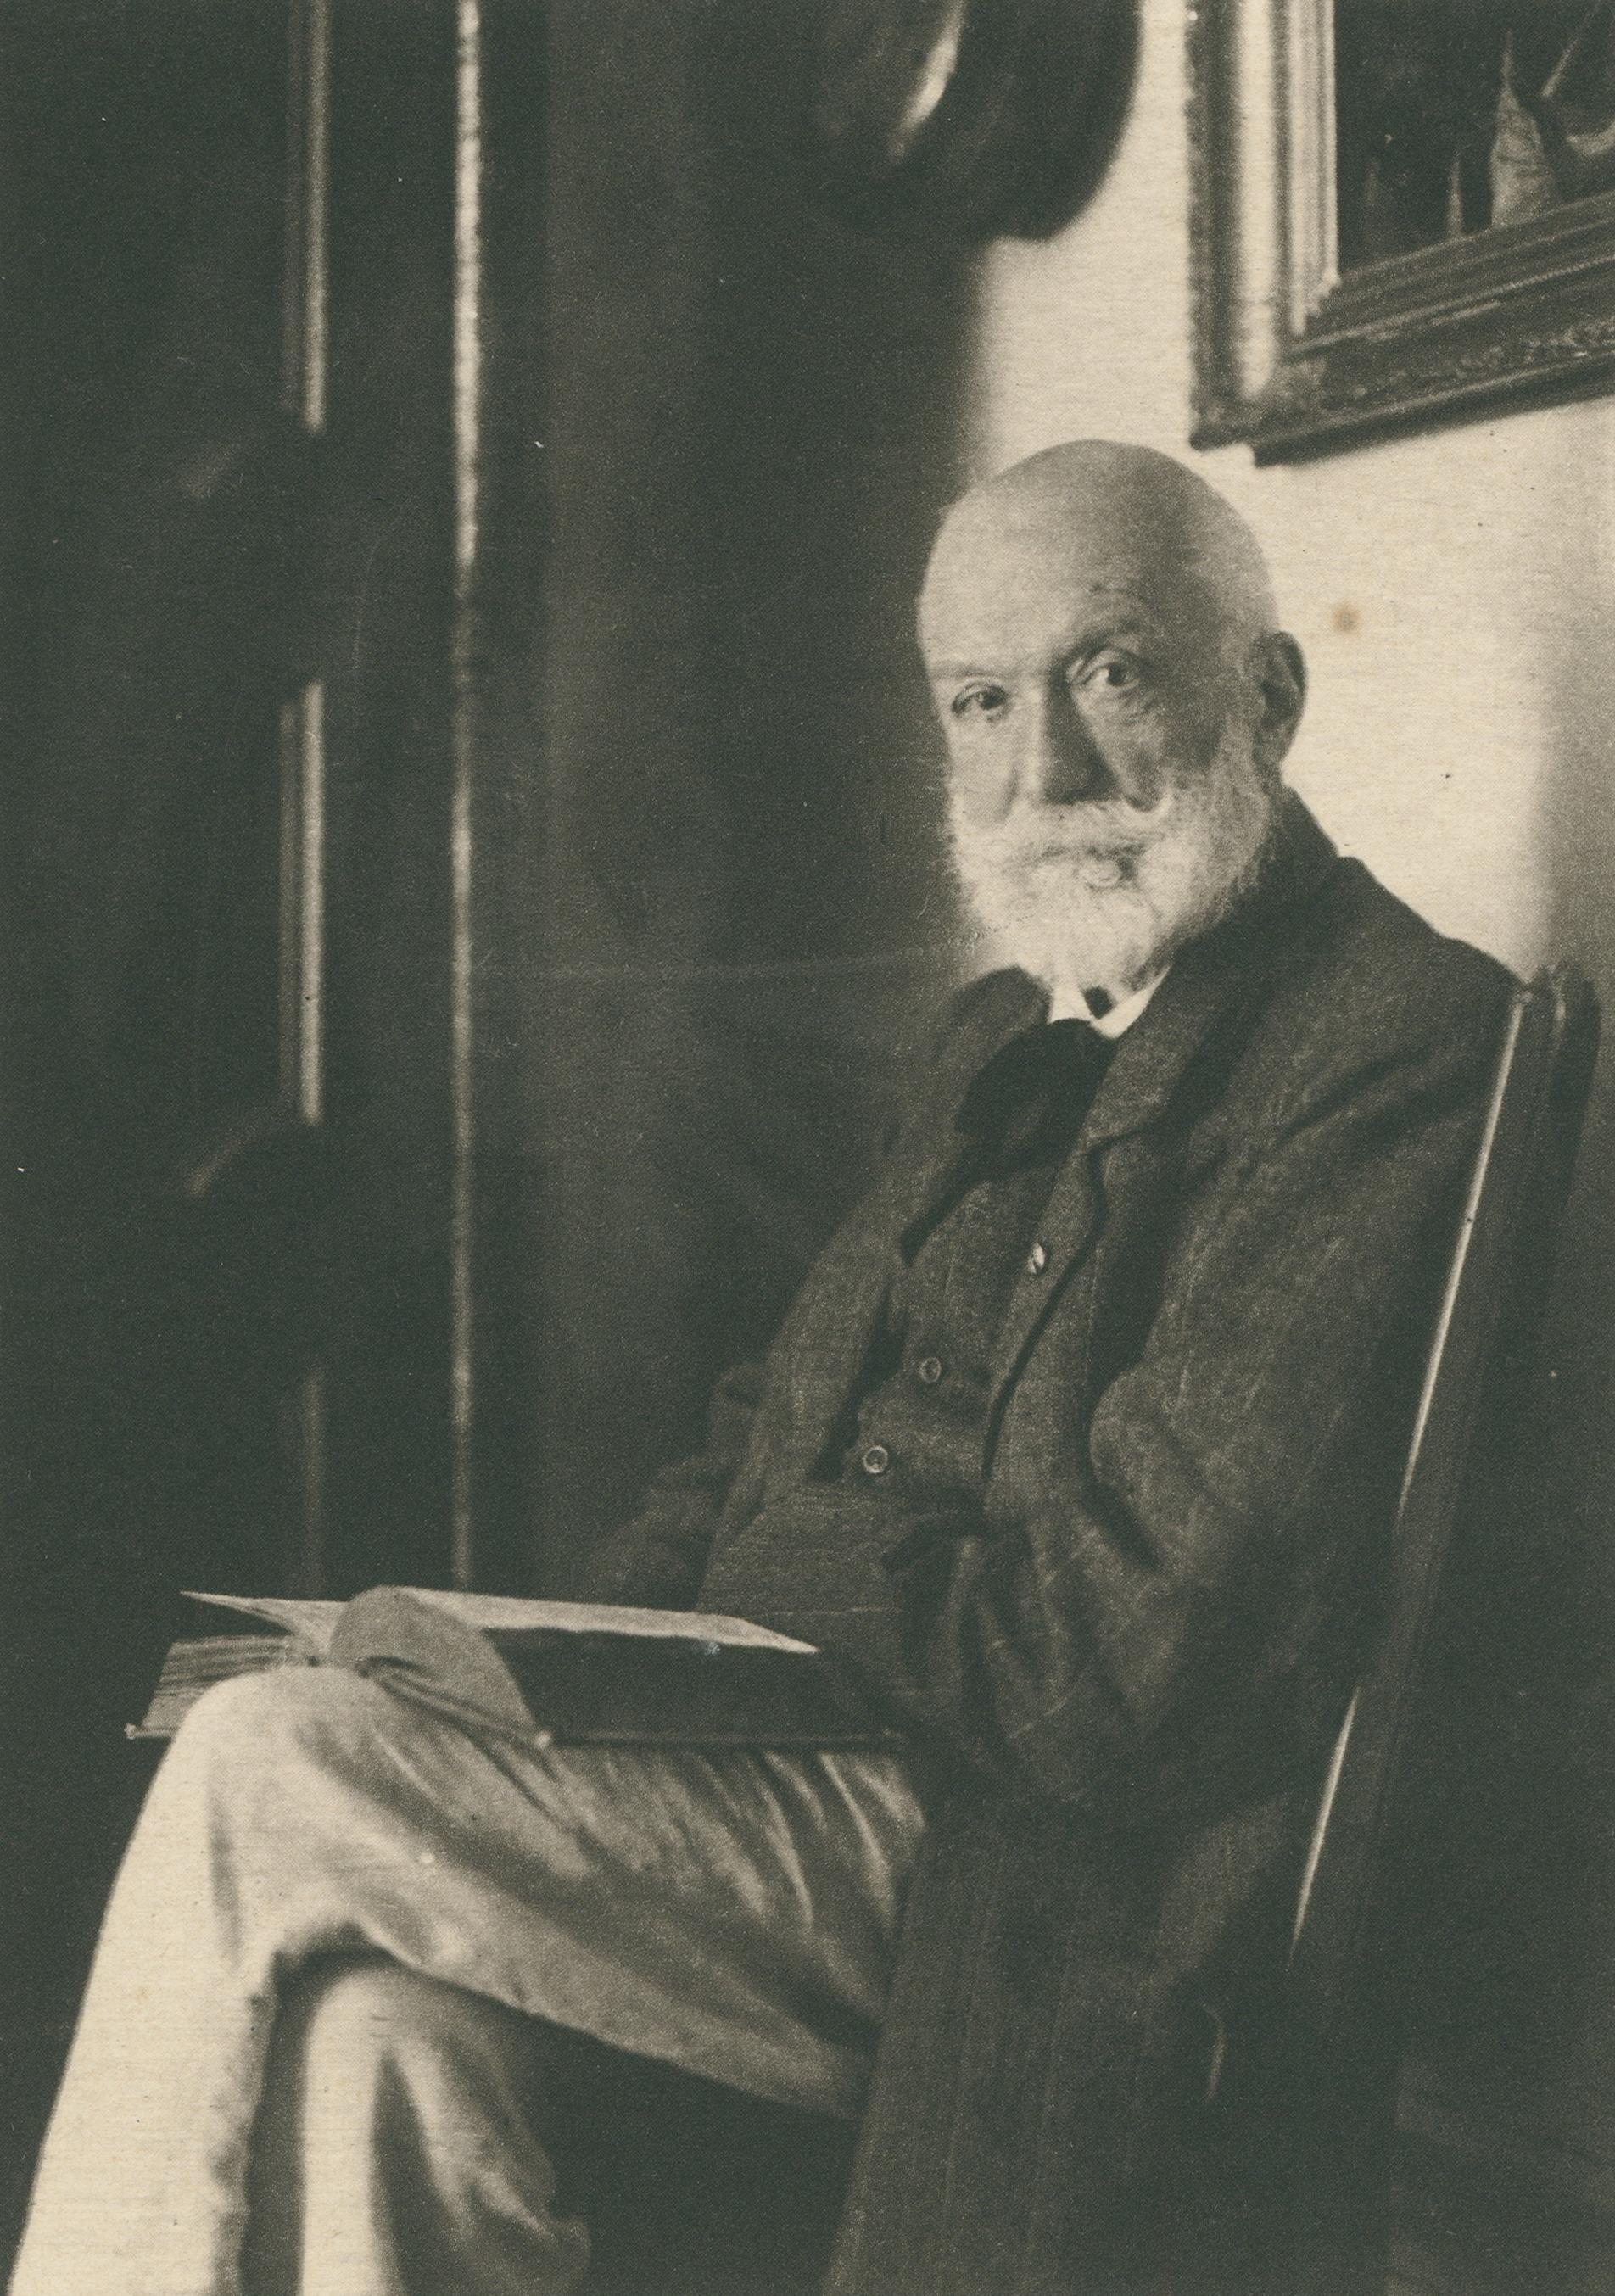 Auguste-Henri Forel, c. 1900